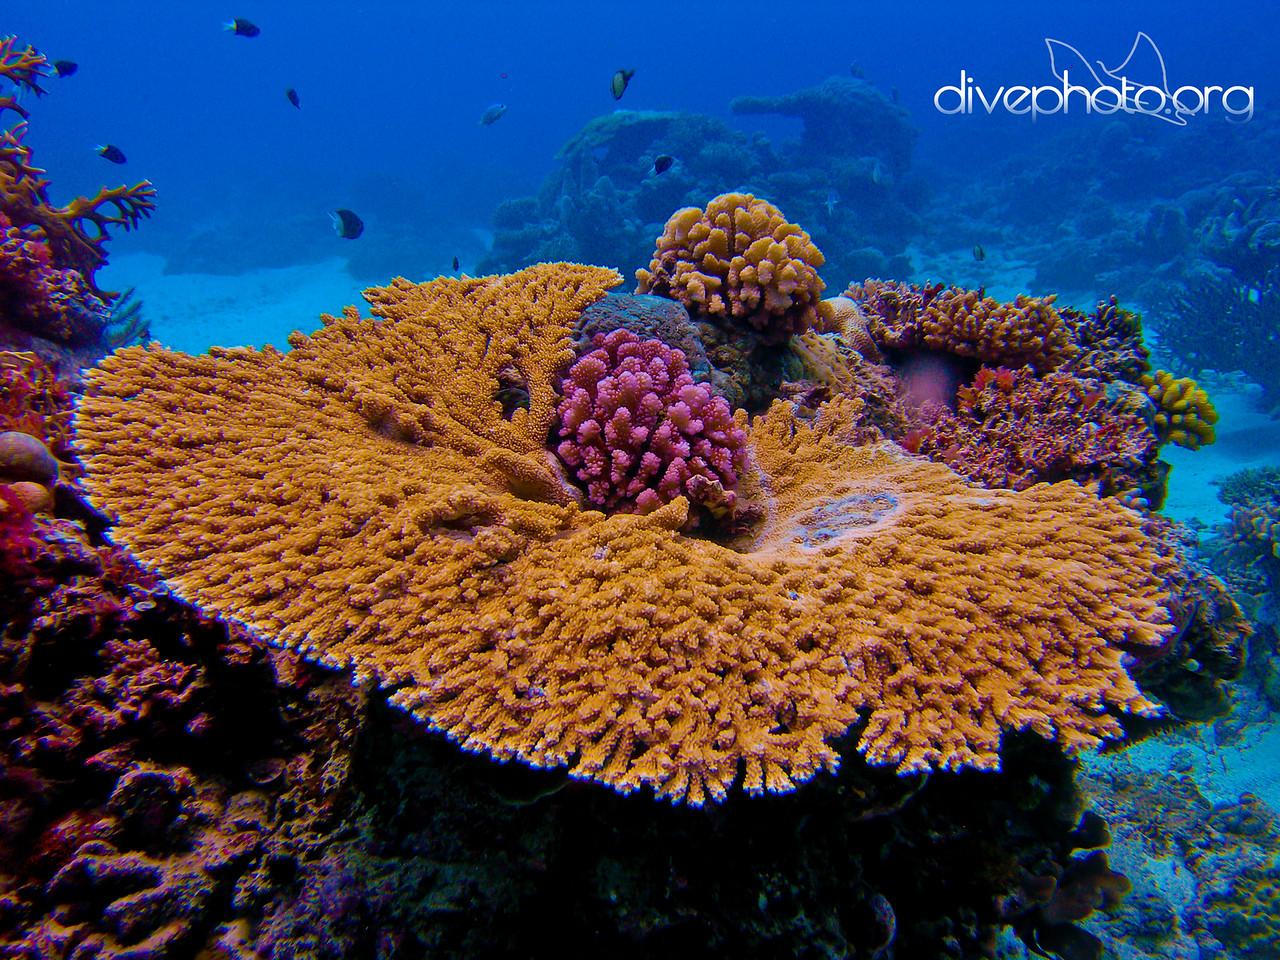 North Horn, Great Barrier Reef, Australia